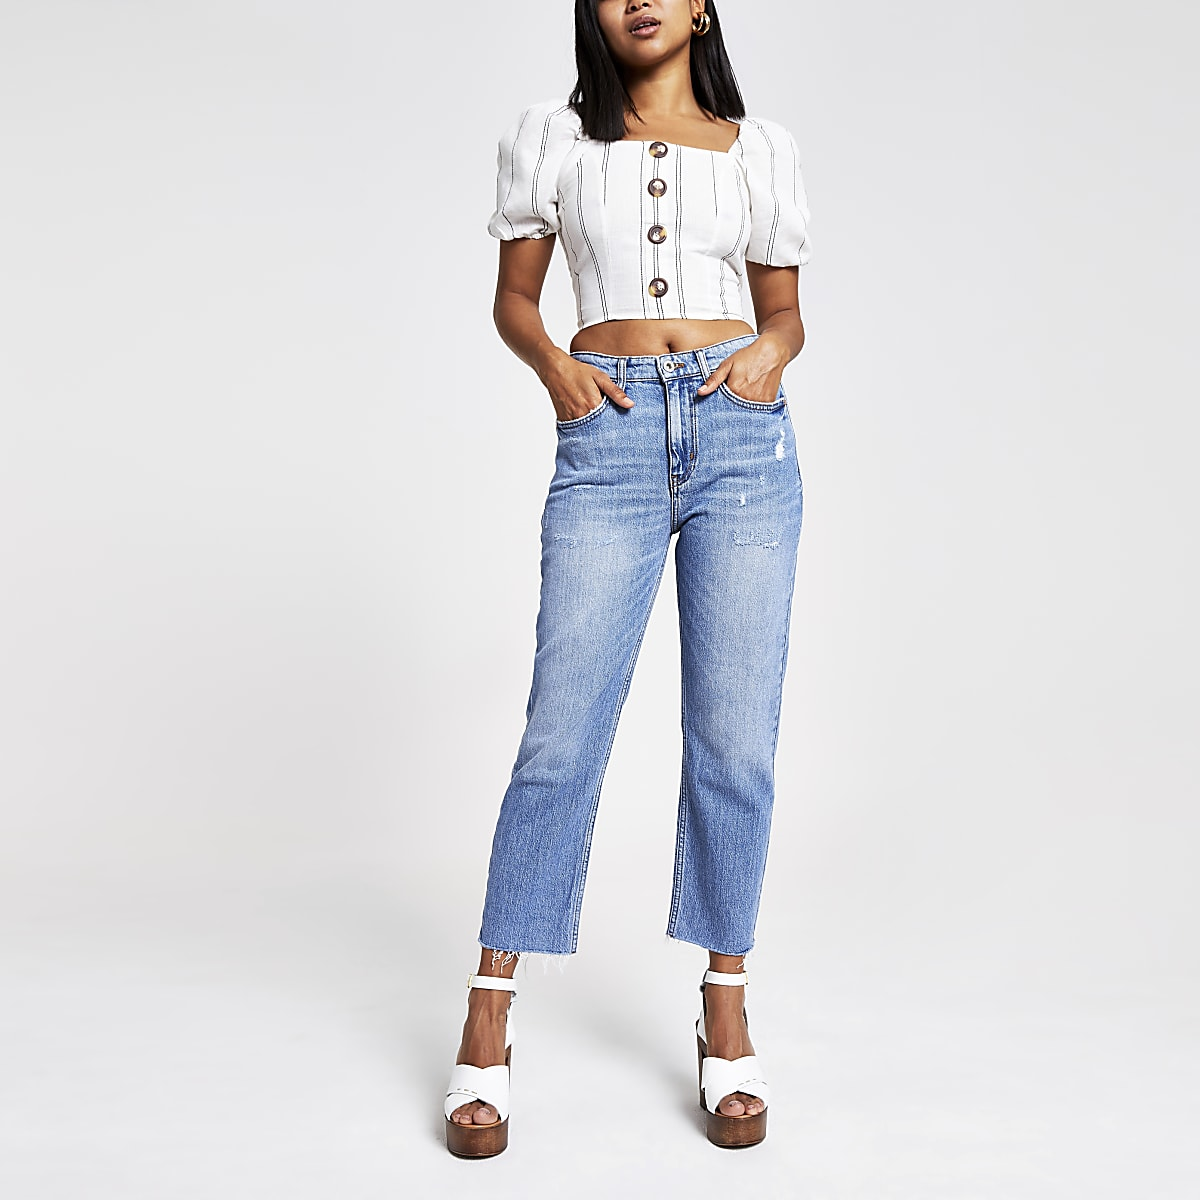 RI Petite - Middenblauwe rechte jeans met gerafelde zoom